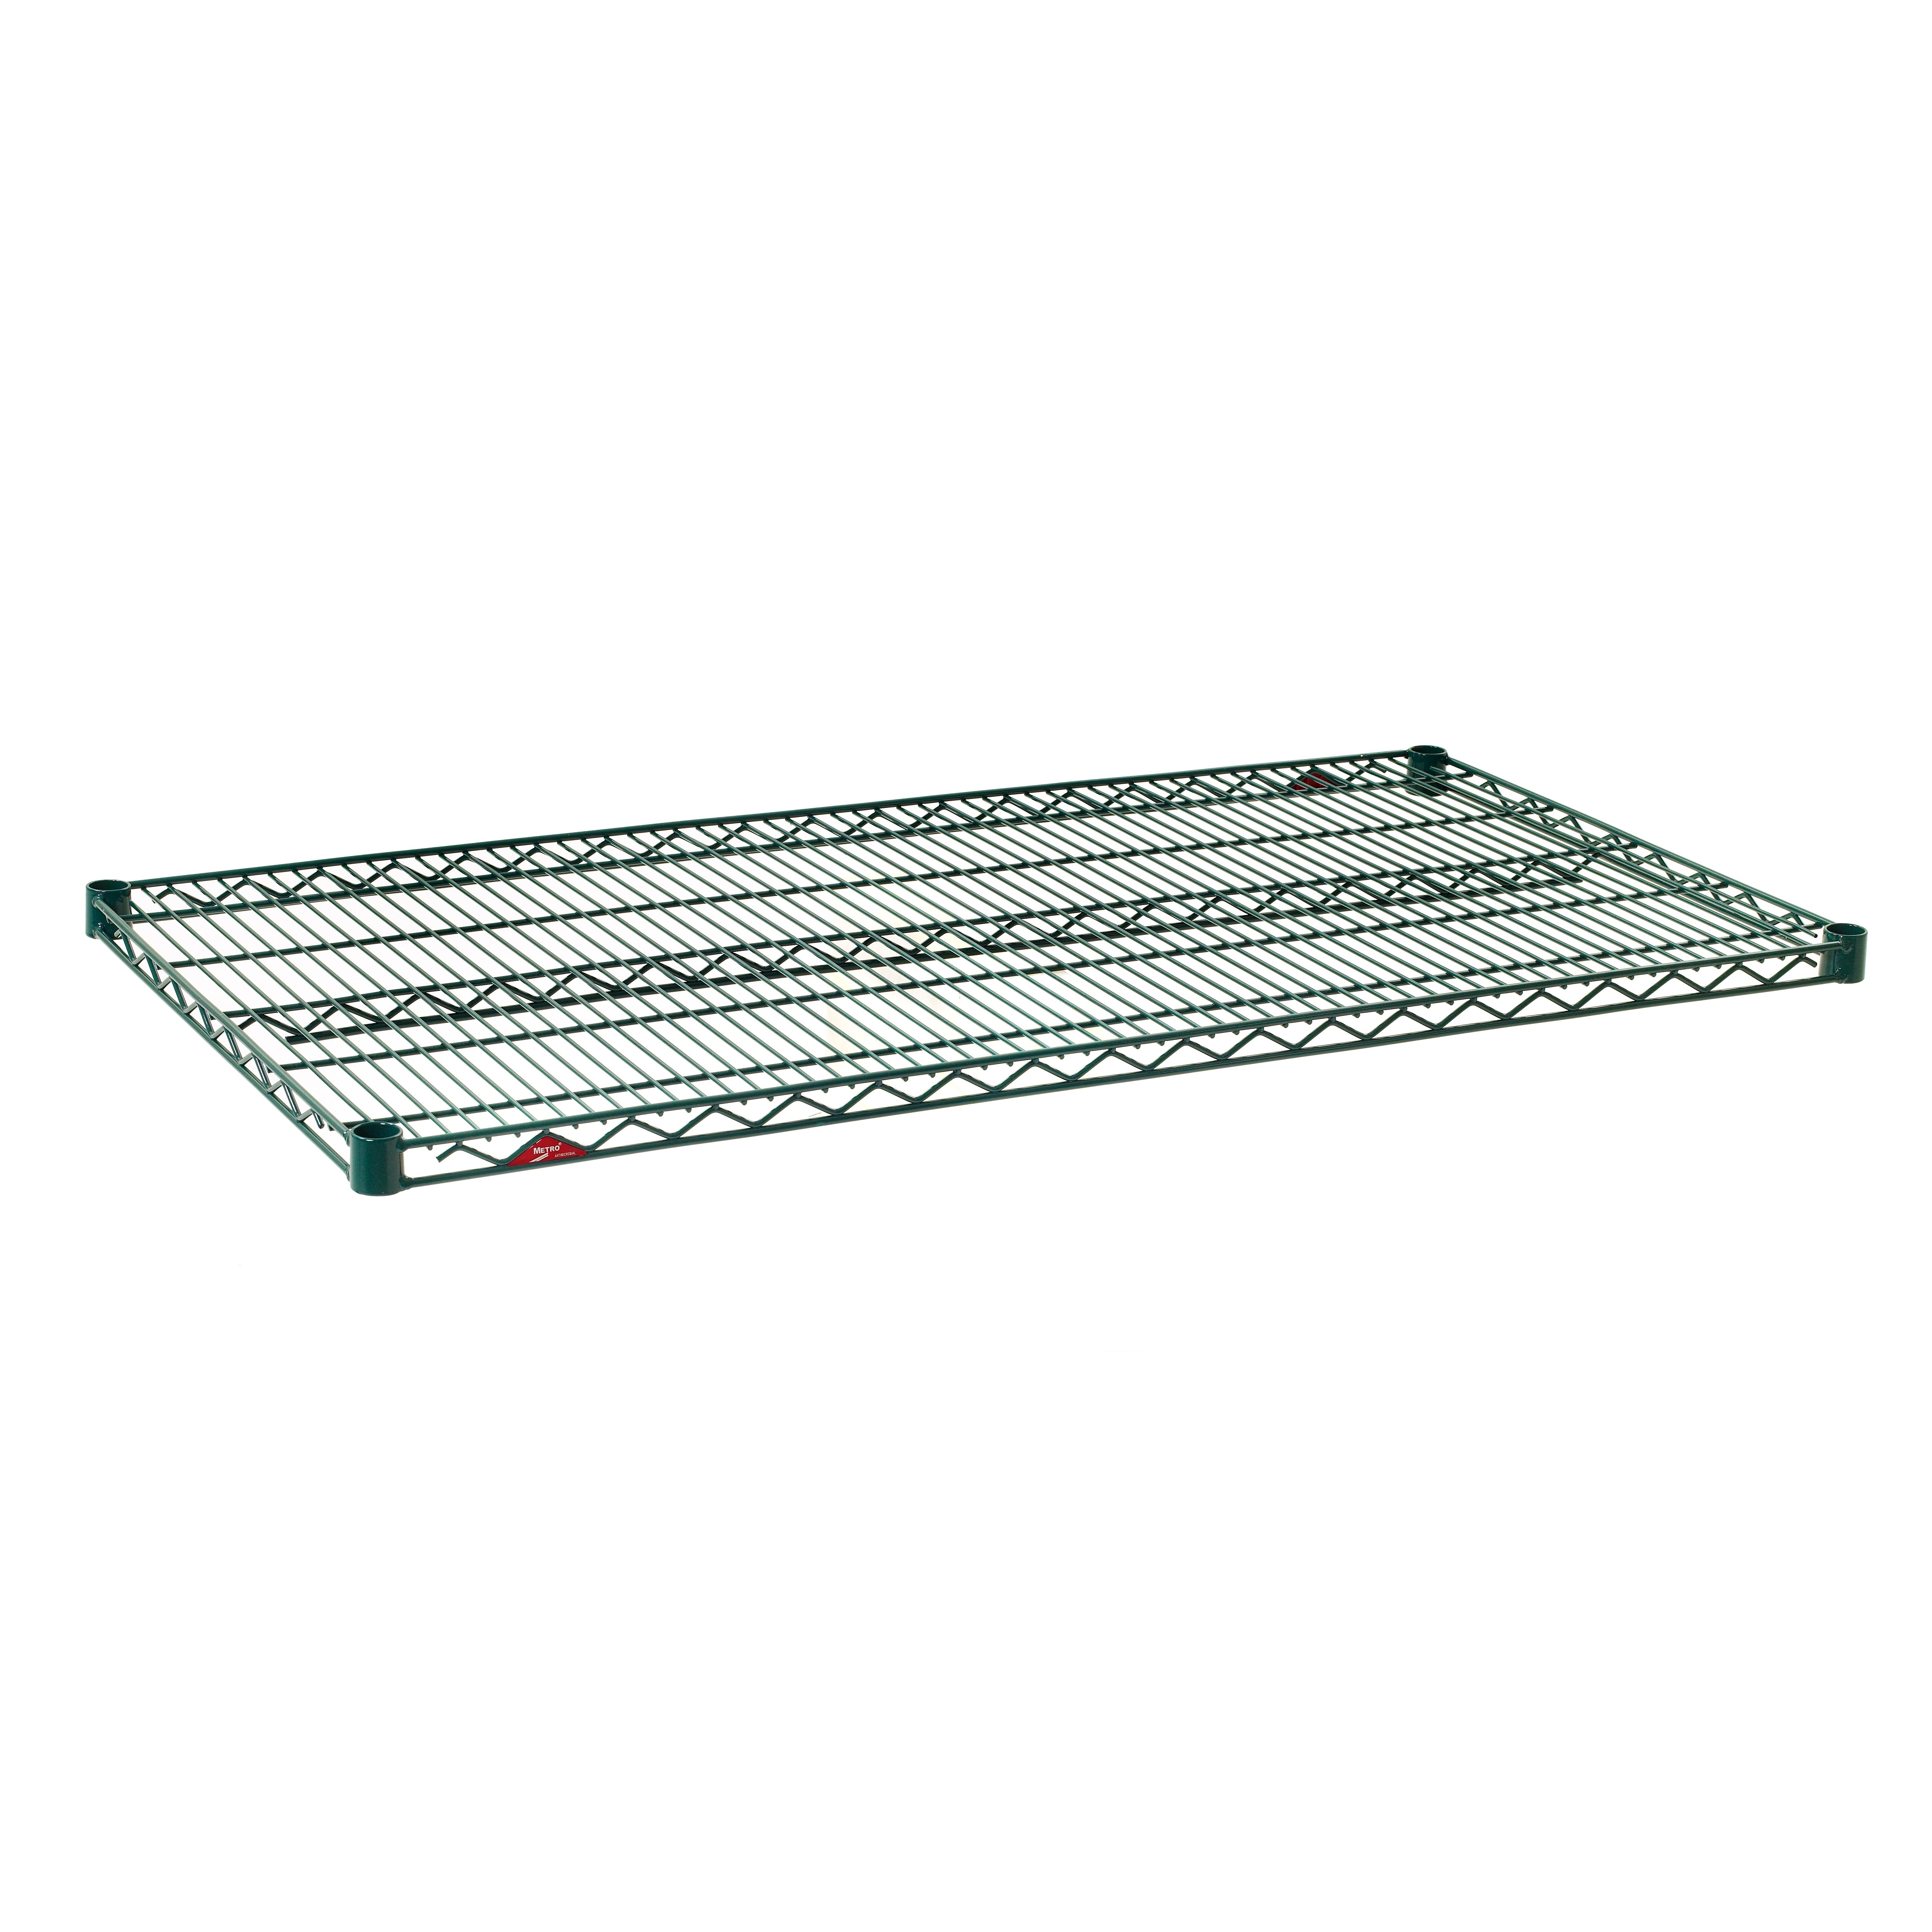 Metro 1460NK3 shelving, racks & carts/wire shelving/wire shelves